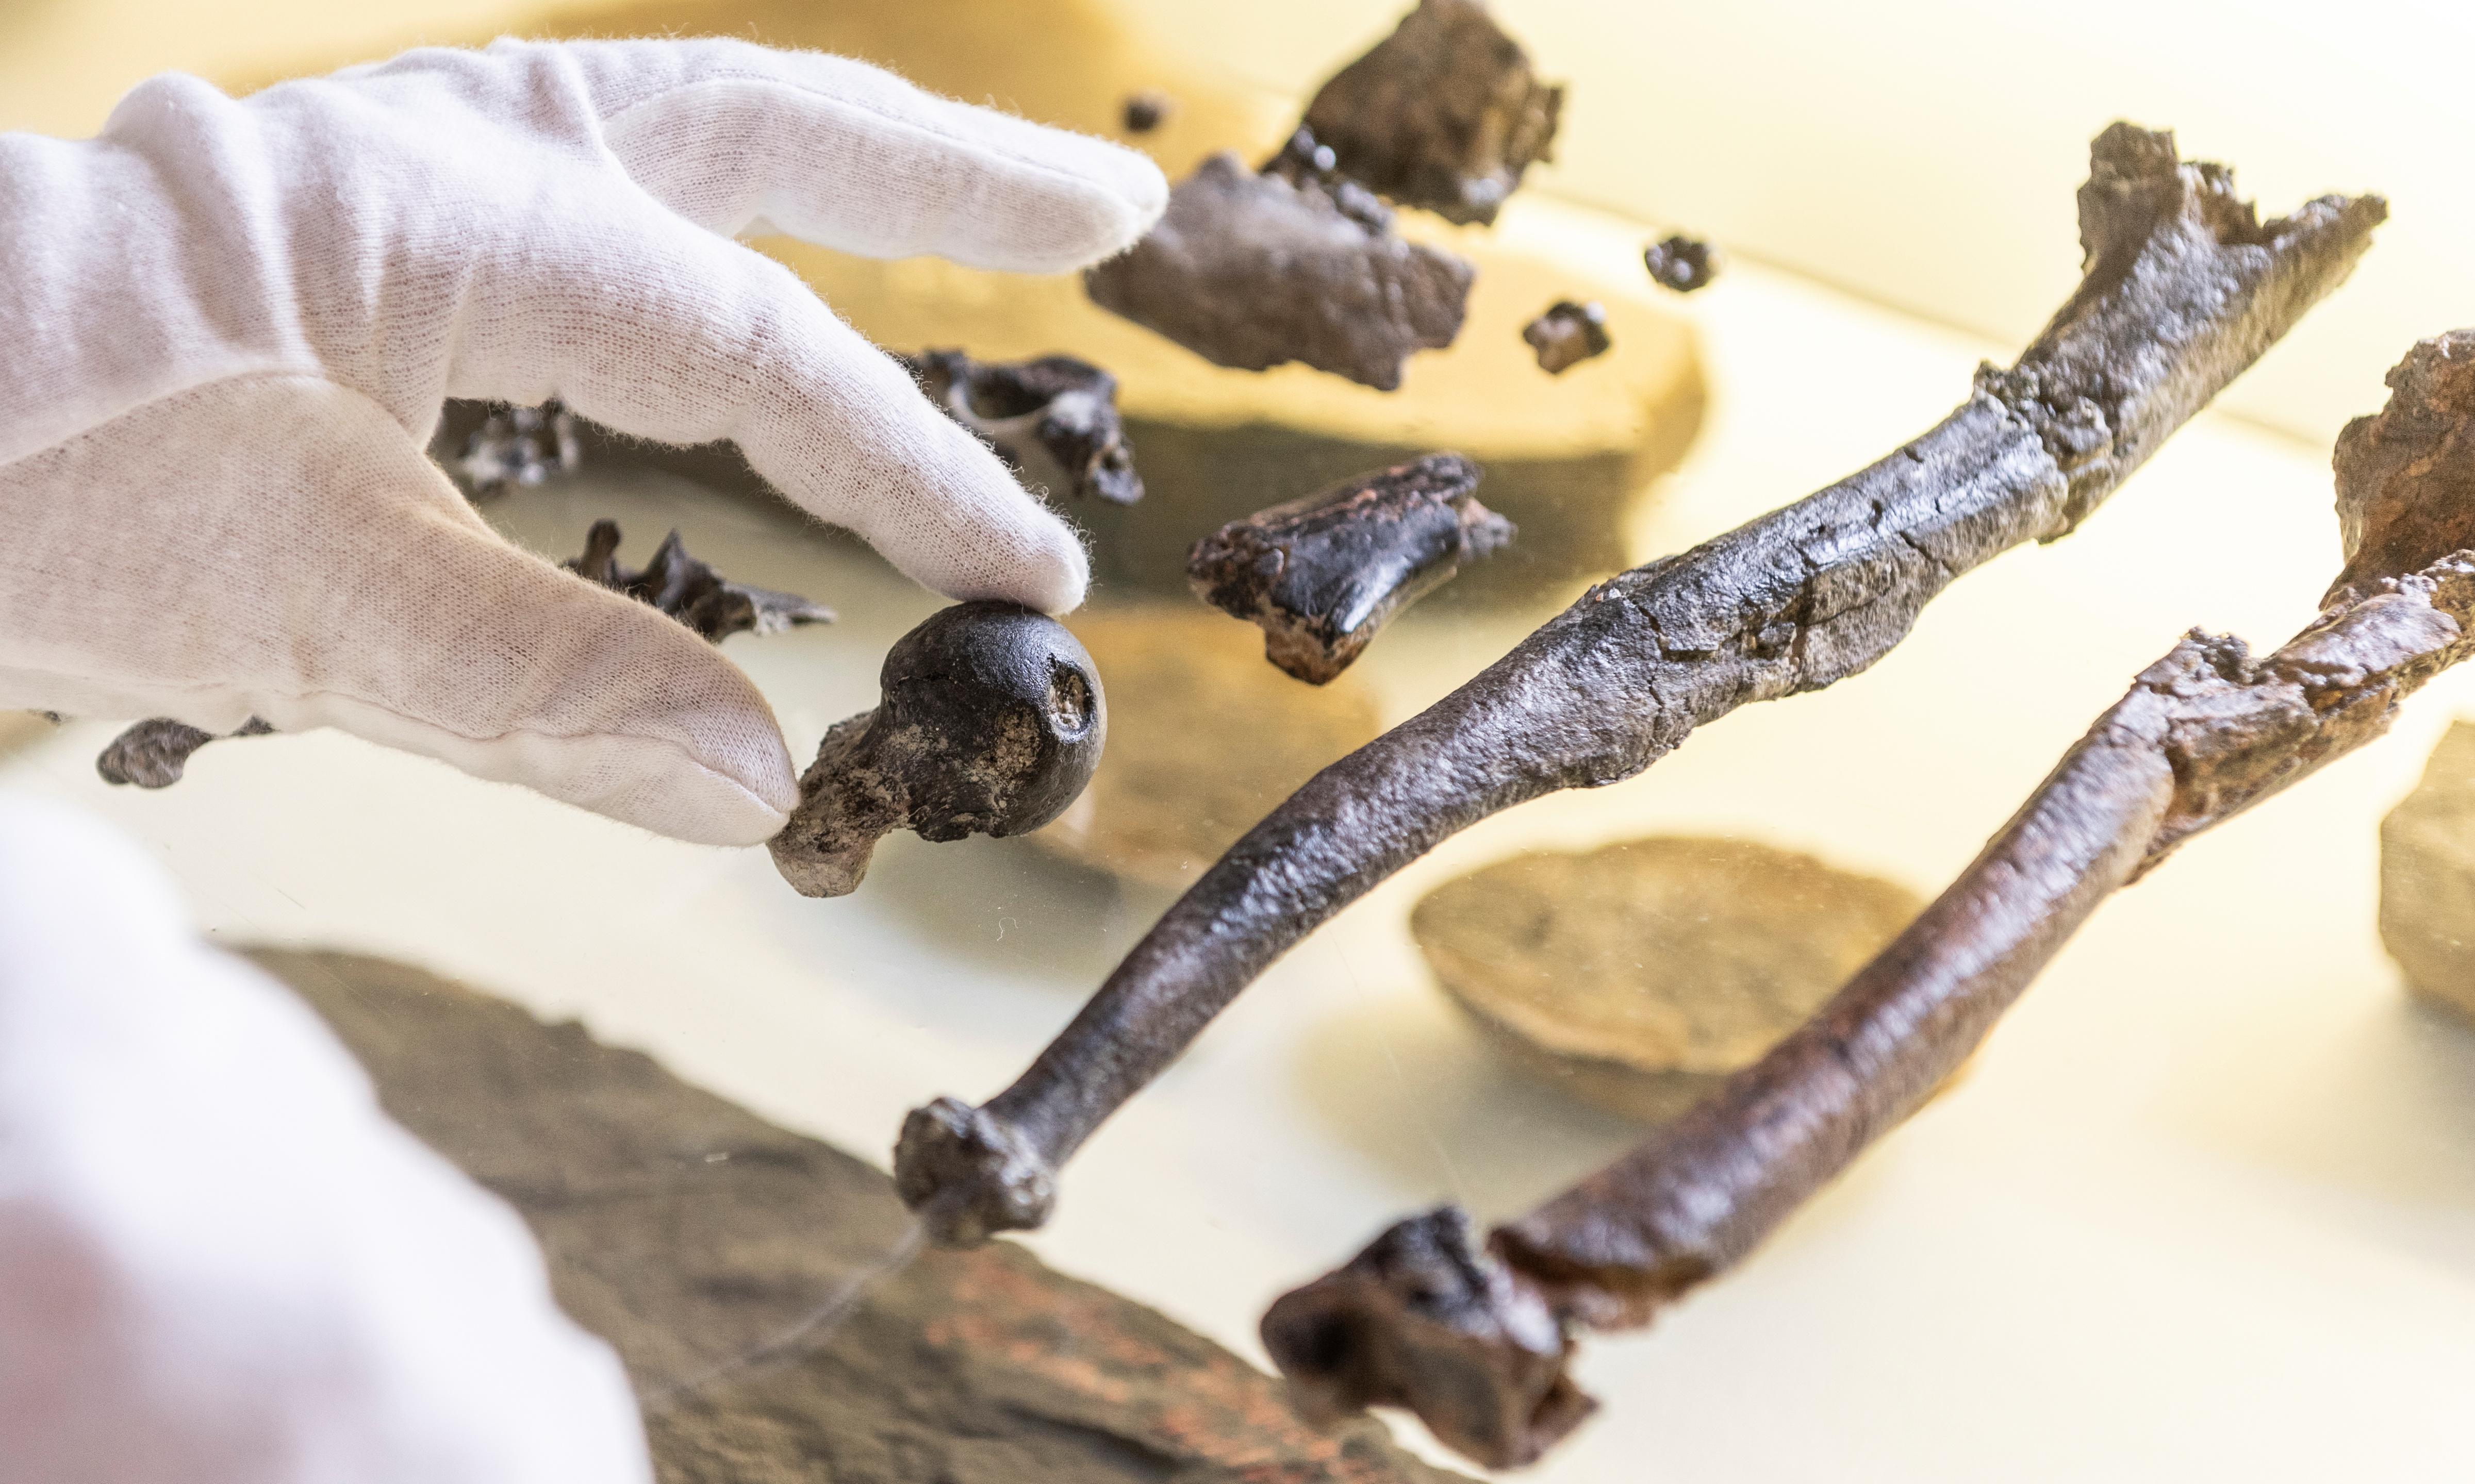 Bones of ape living 12m years ago point to genesis of upright walking